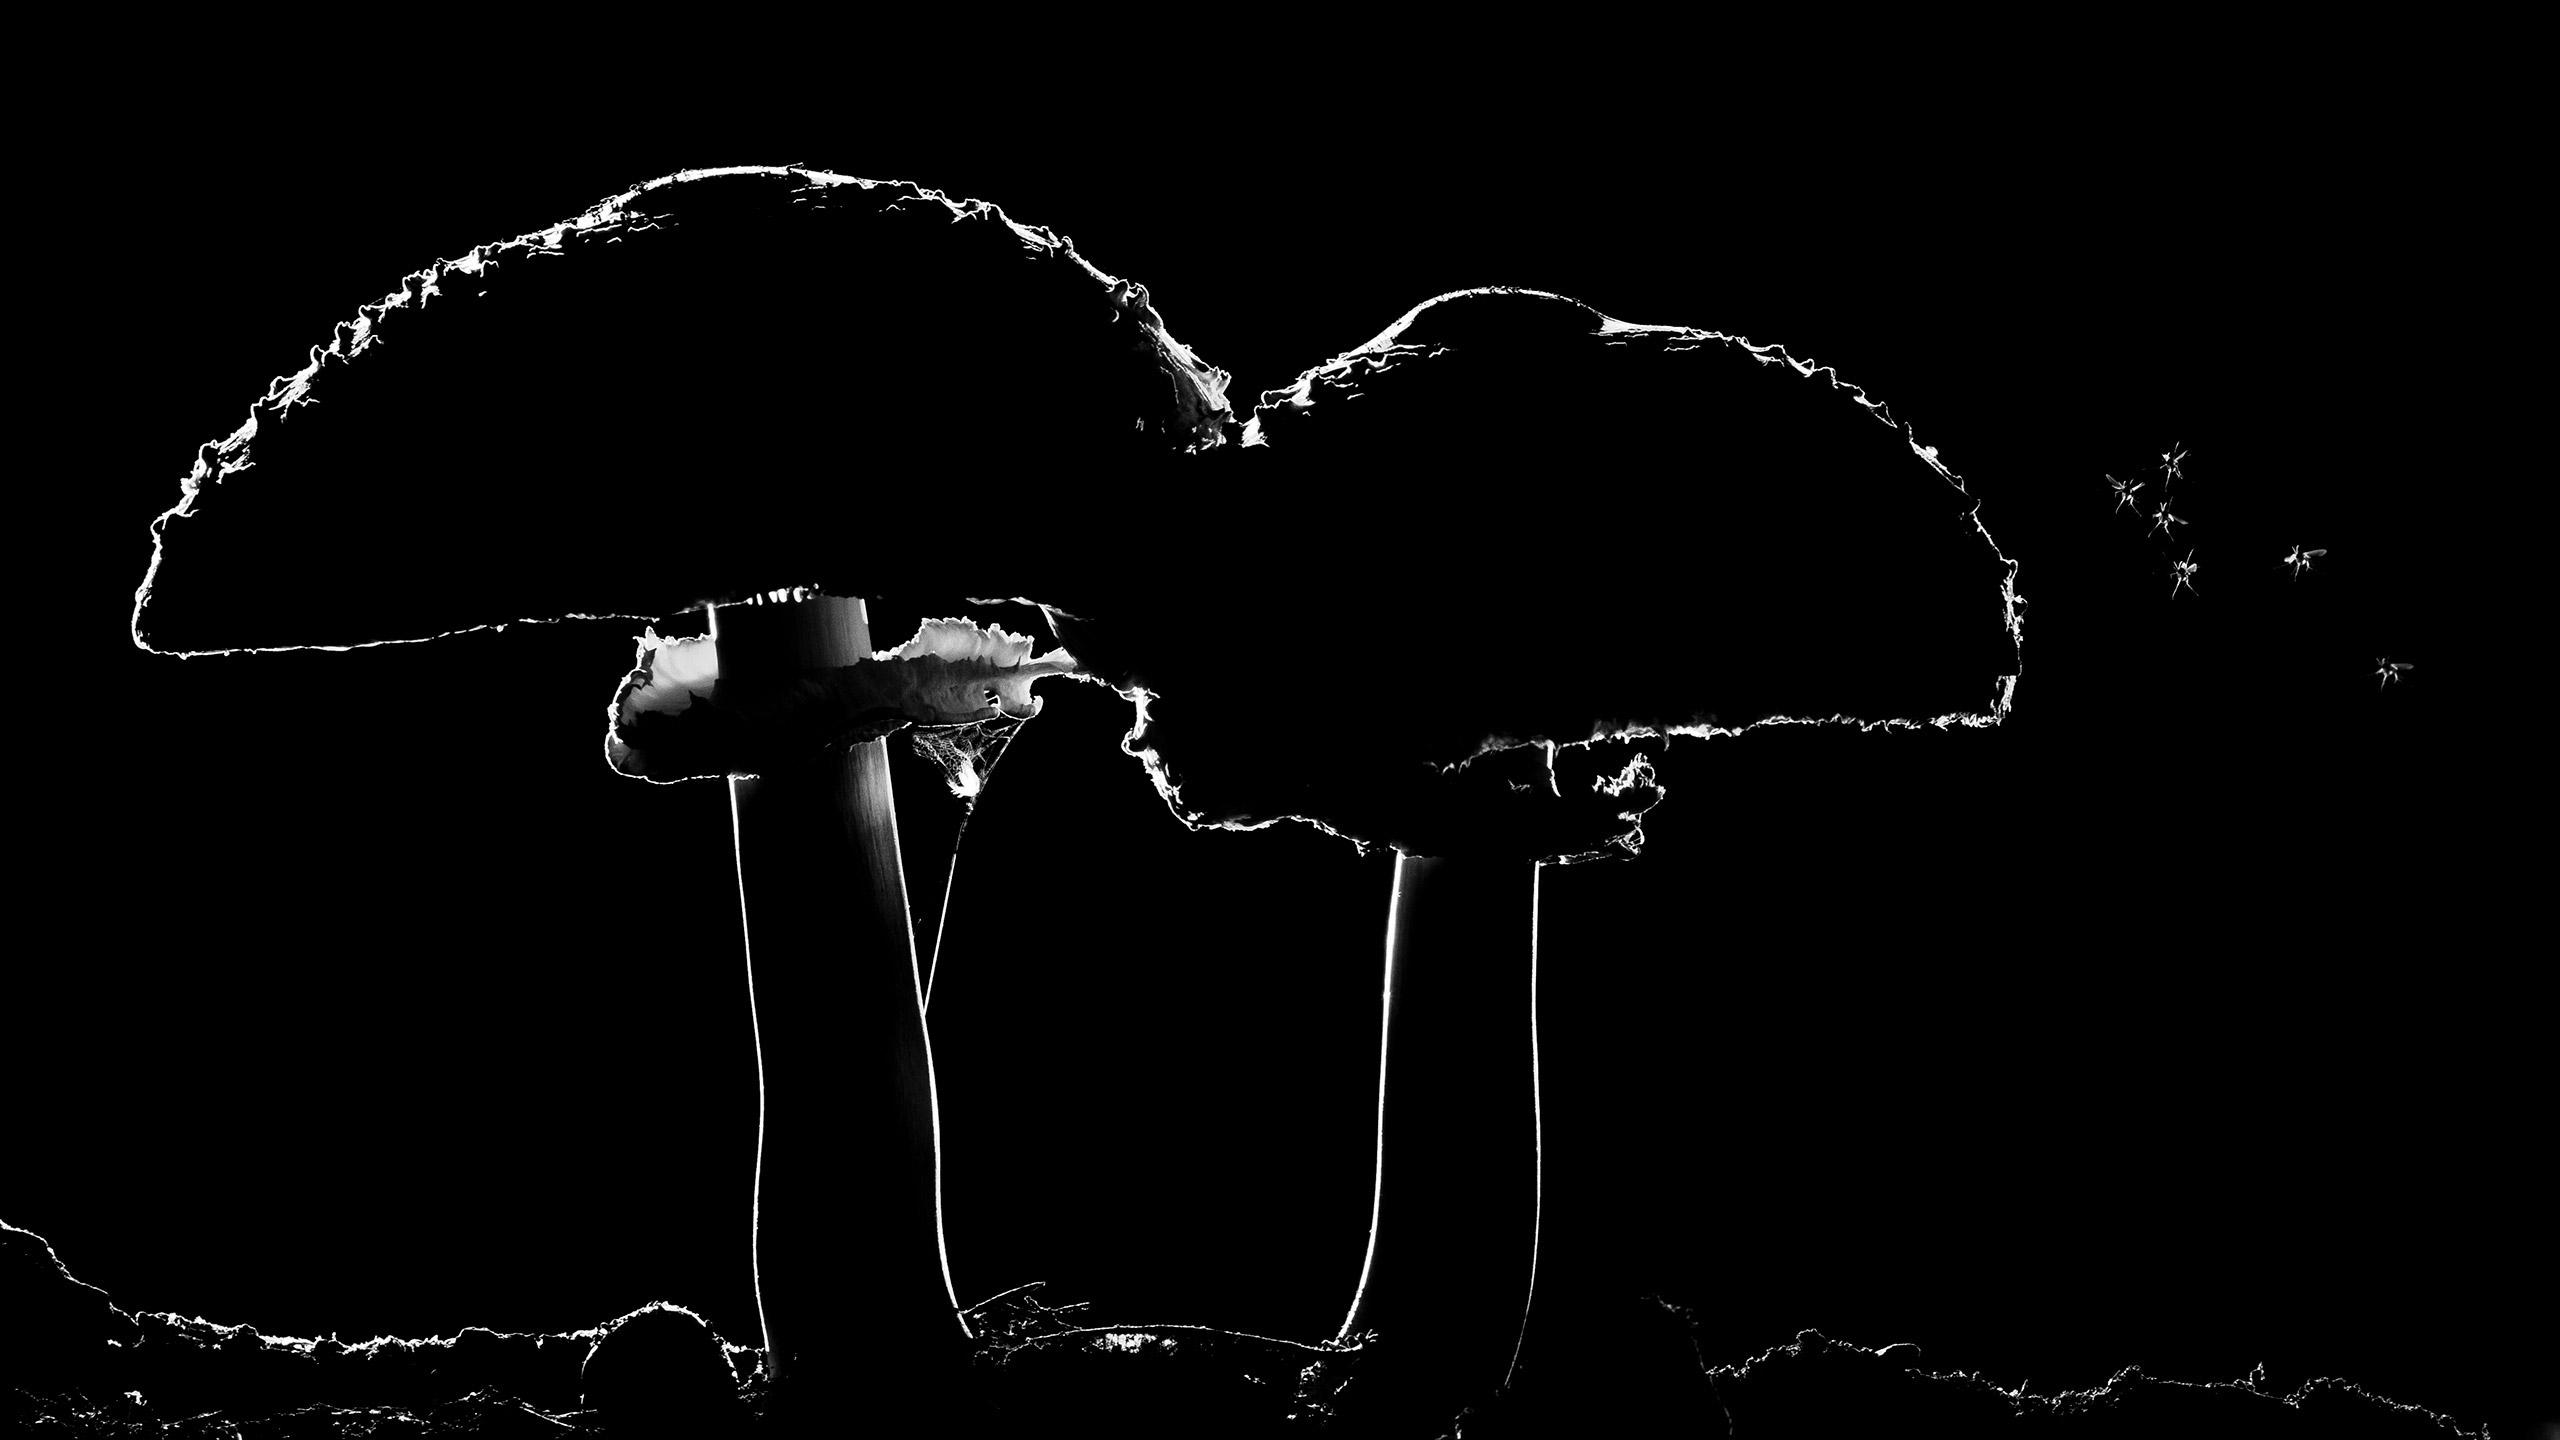 Mosquito Mushrooms, © Csaba Gonye, Winner, Golden Turtle Photo Contest